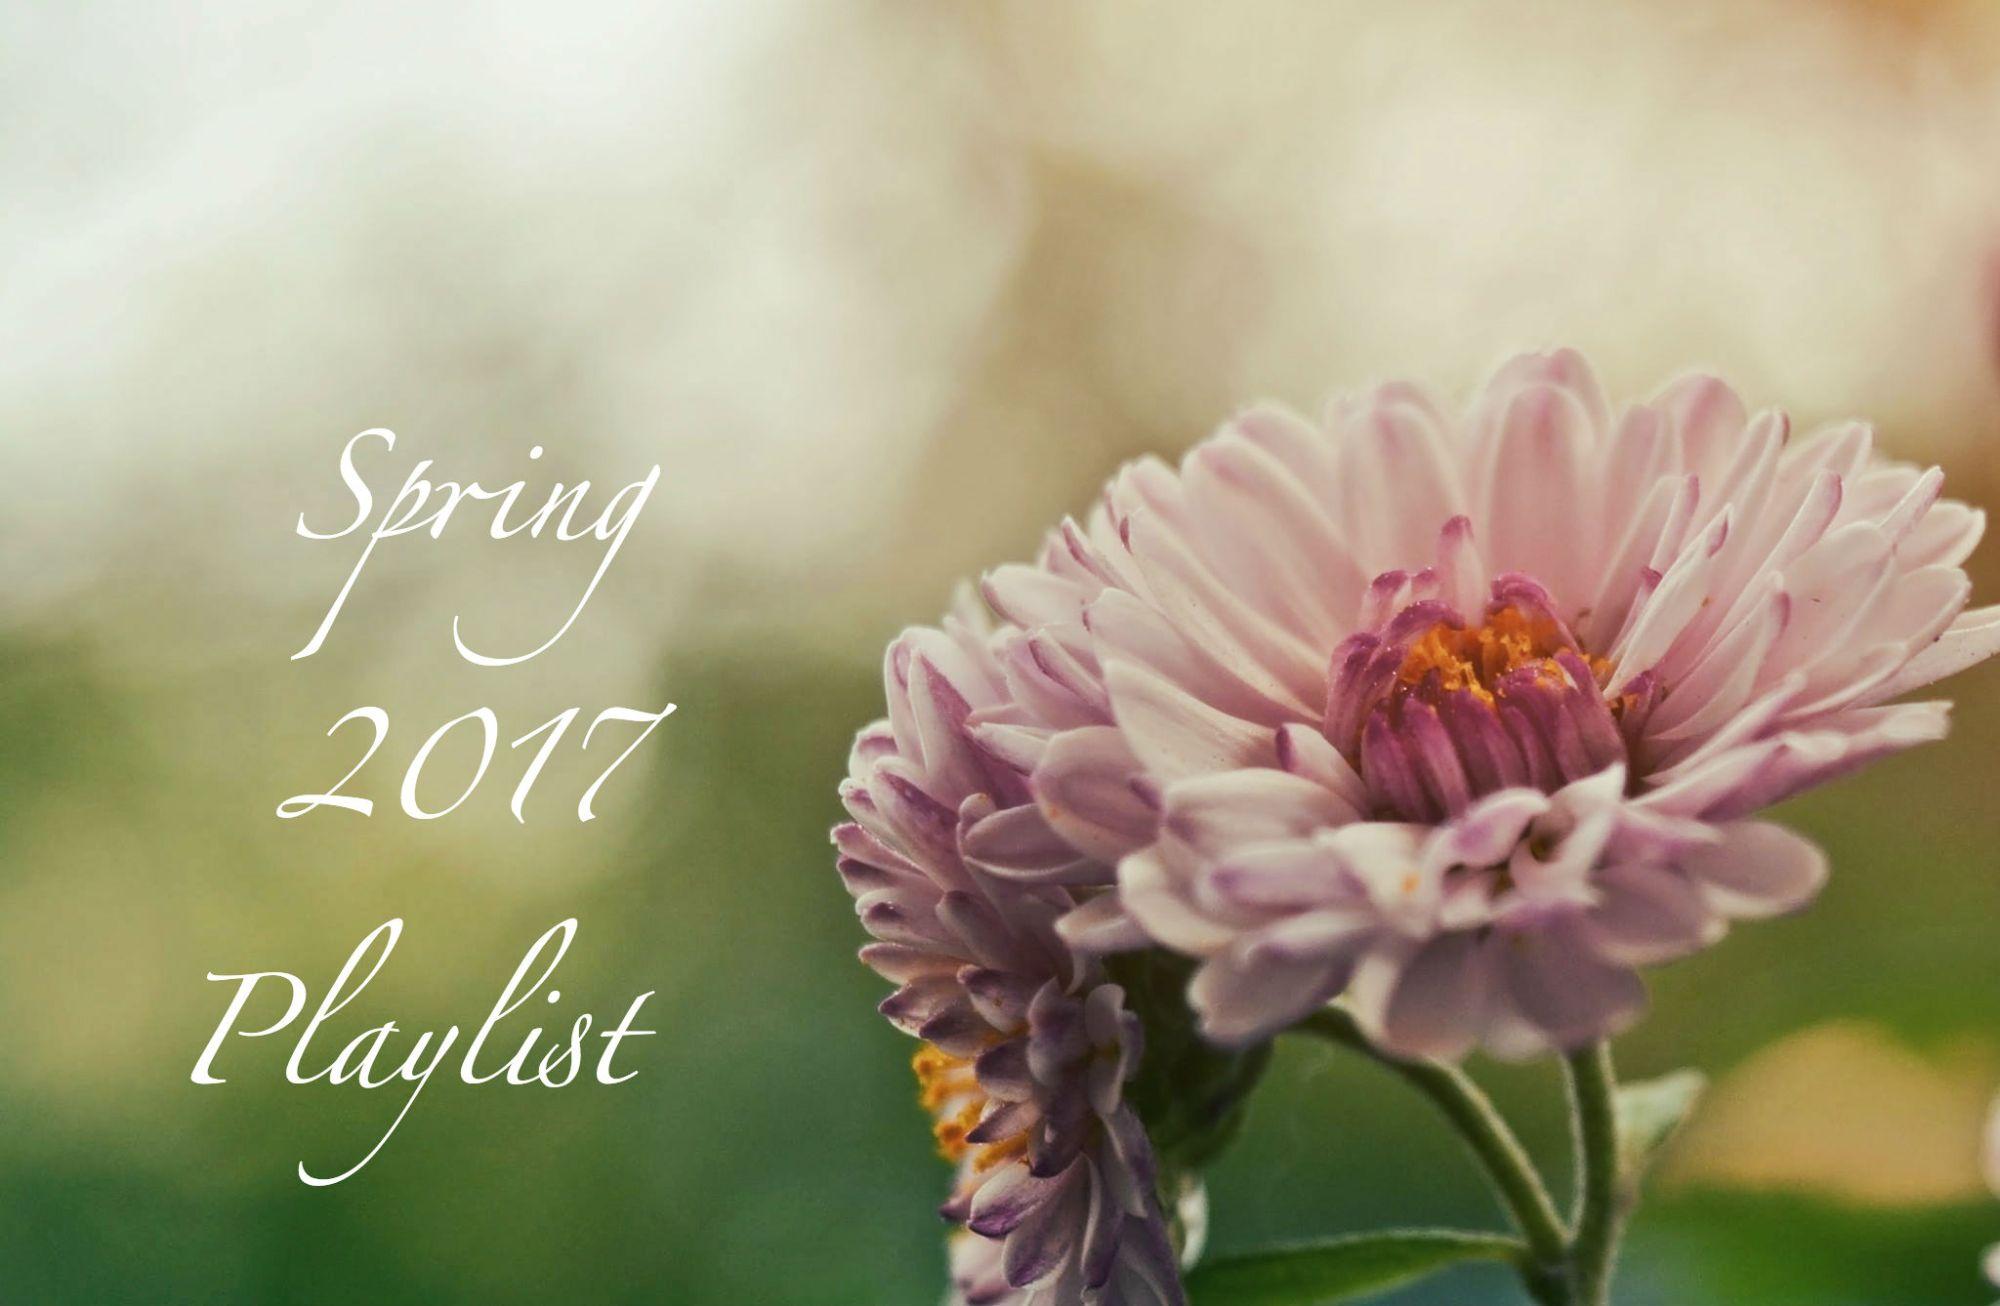 Spring-2017-Playlist-2000